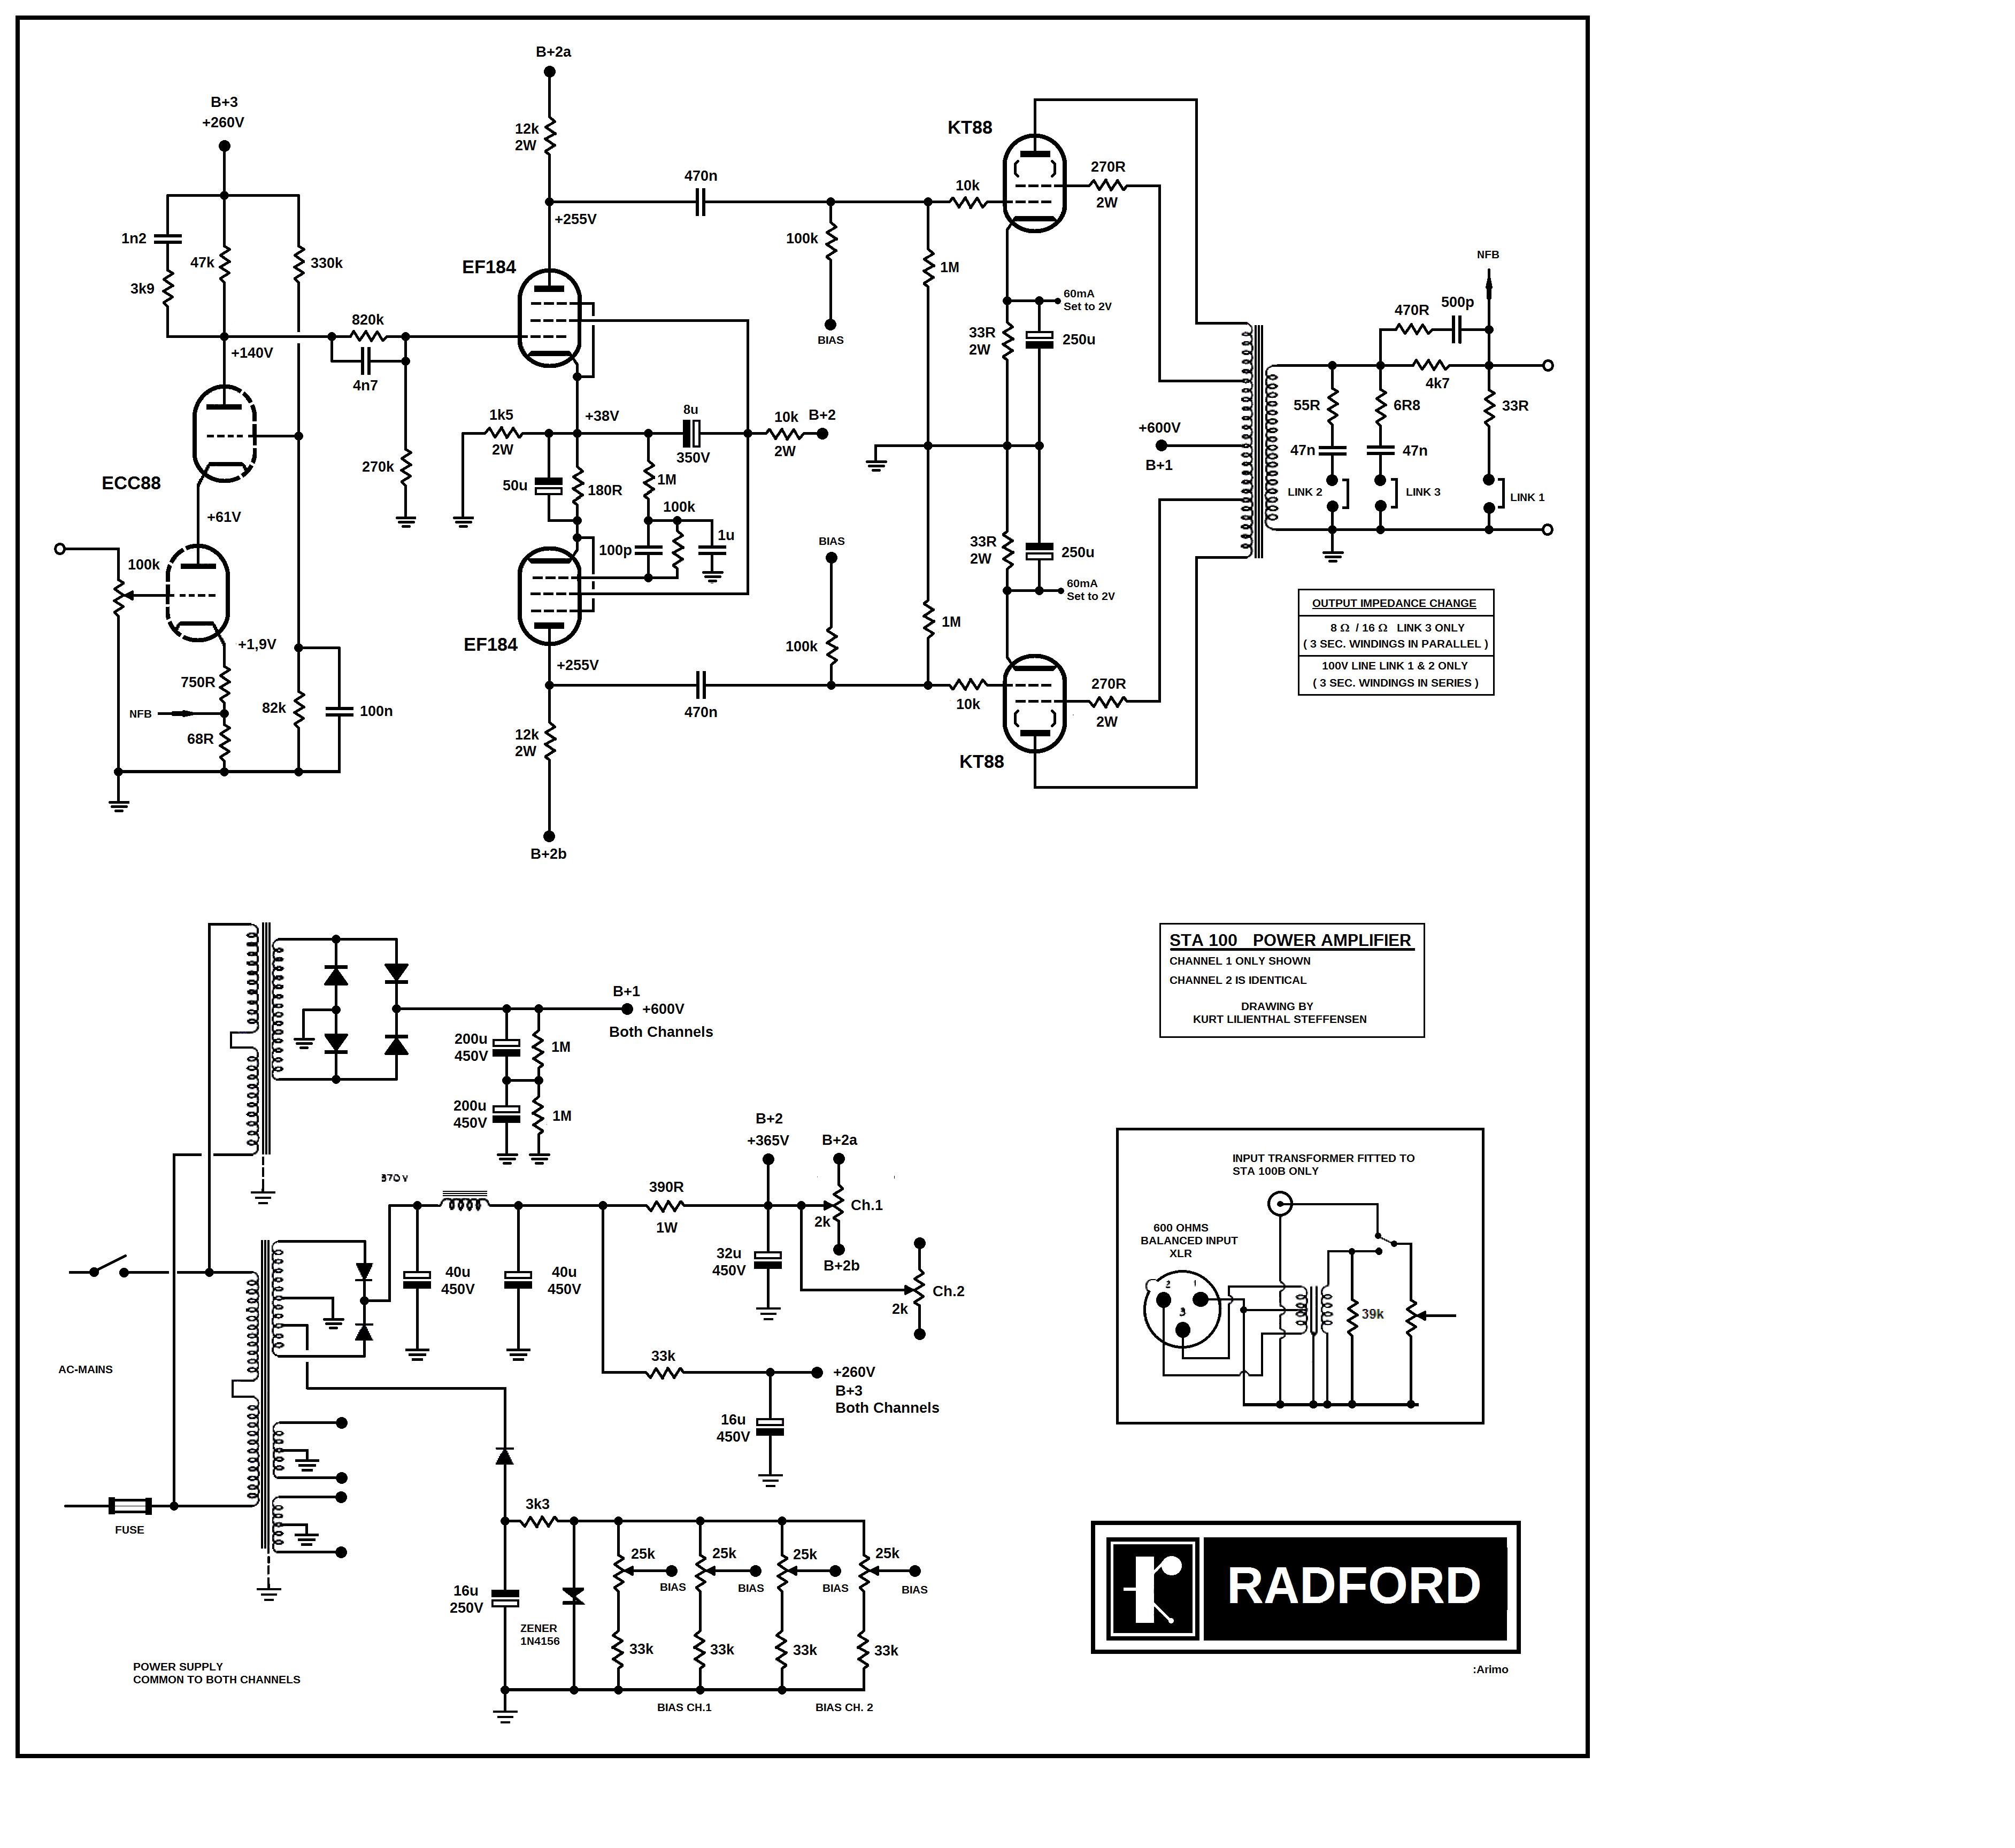 Pin On Hi Fidelity Stereo System Hi Quality Sound